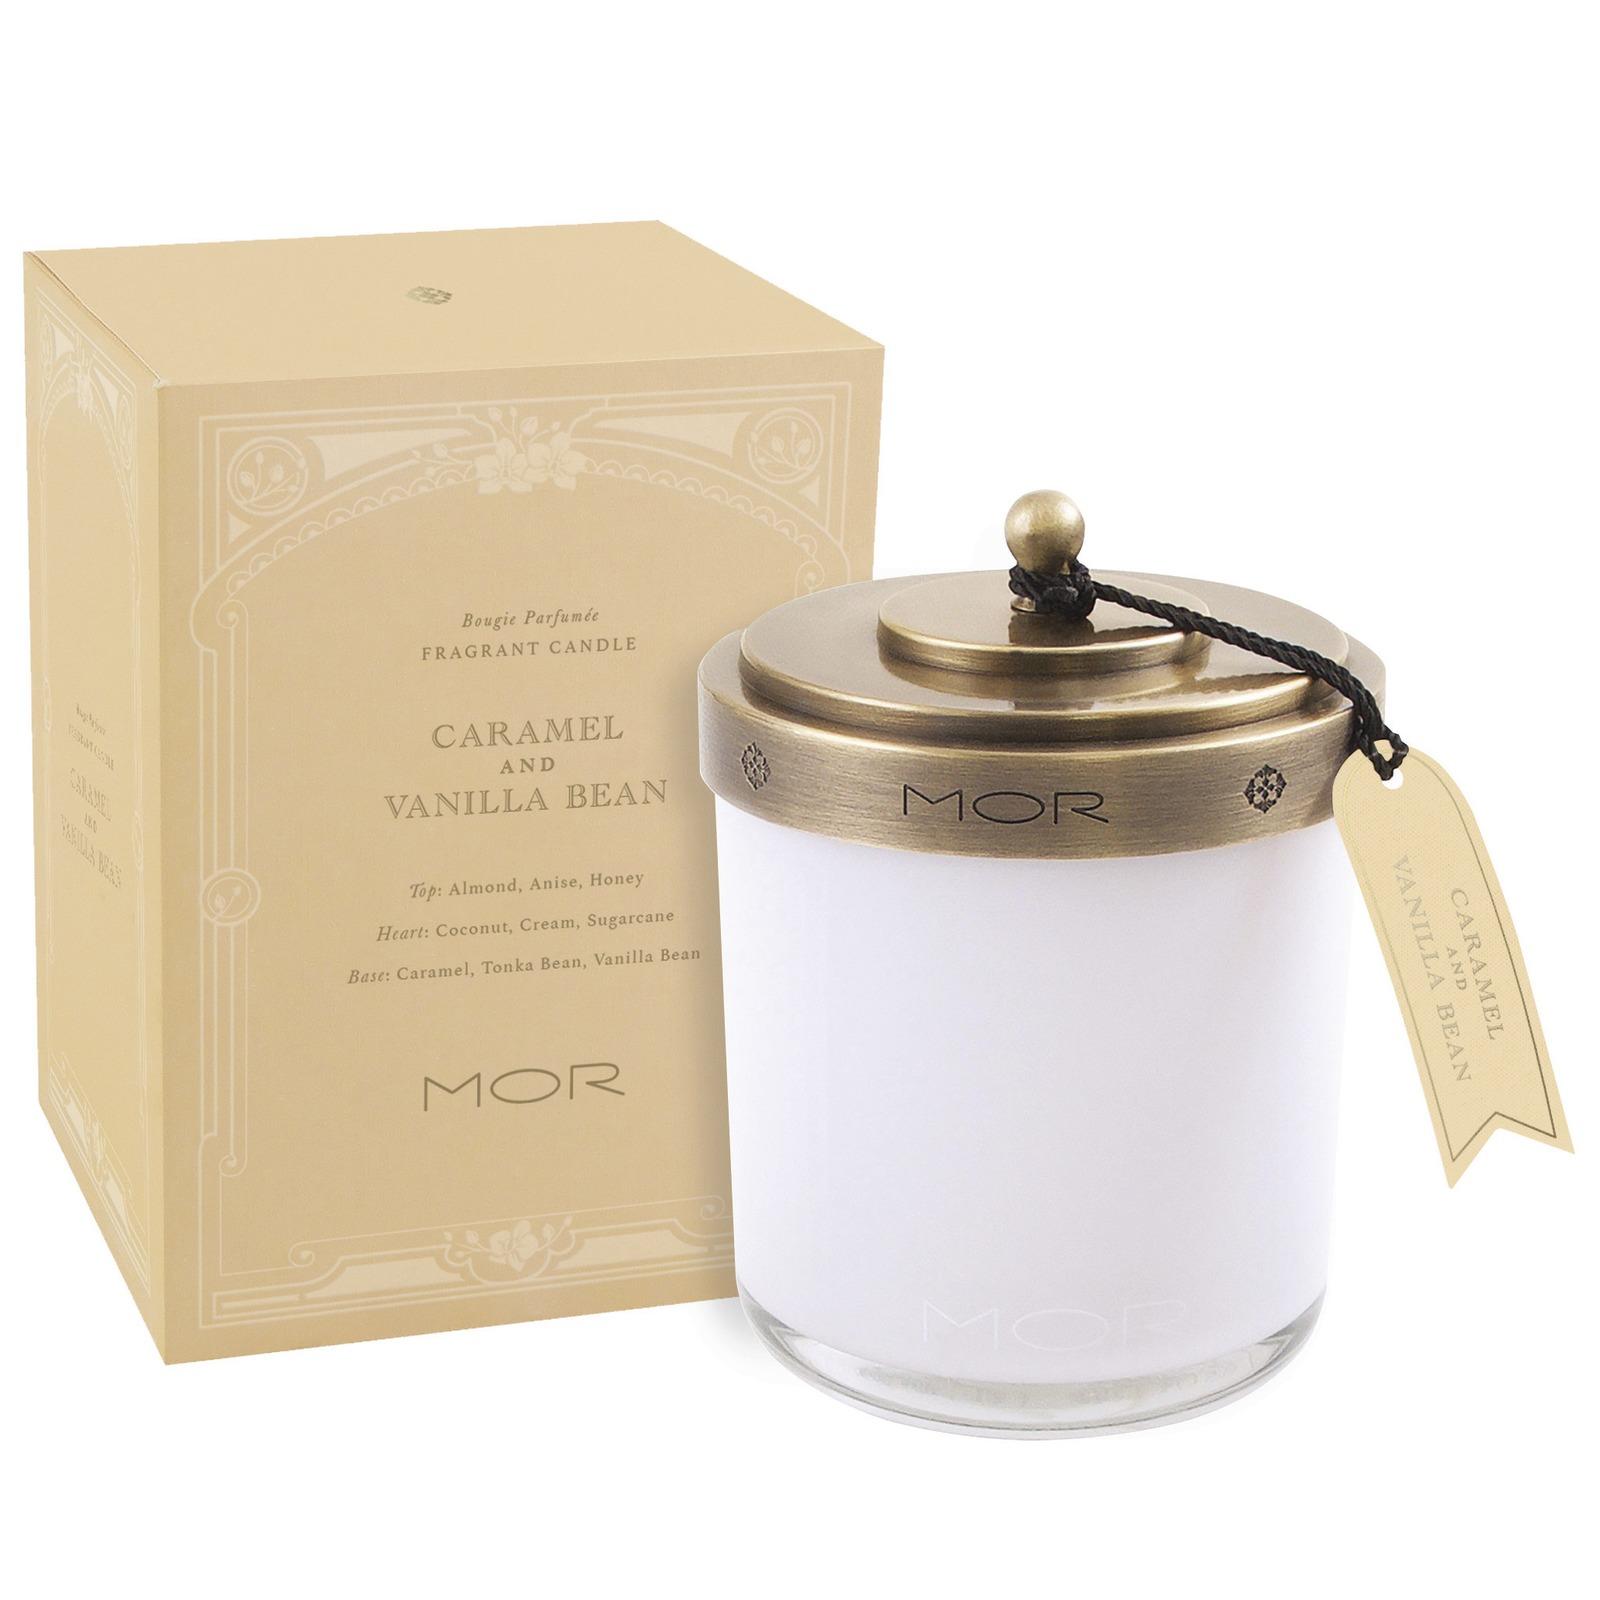 MOR Fragrant Candle - Caramel & Vanilla Bean image